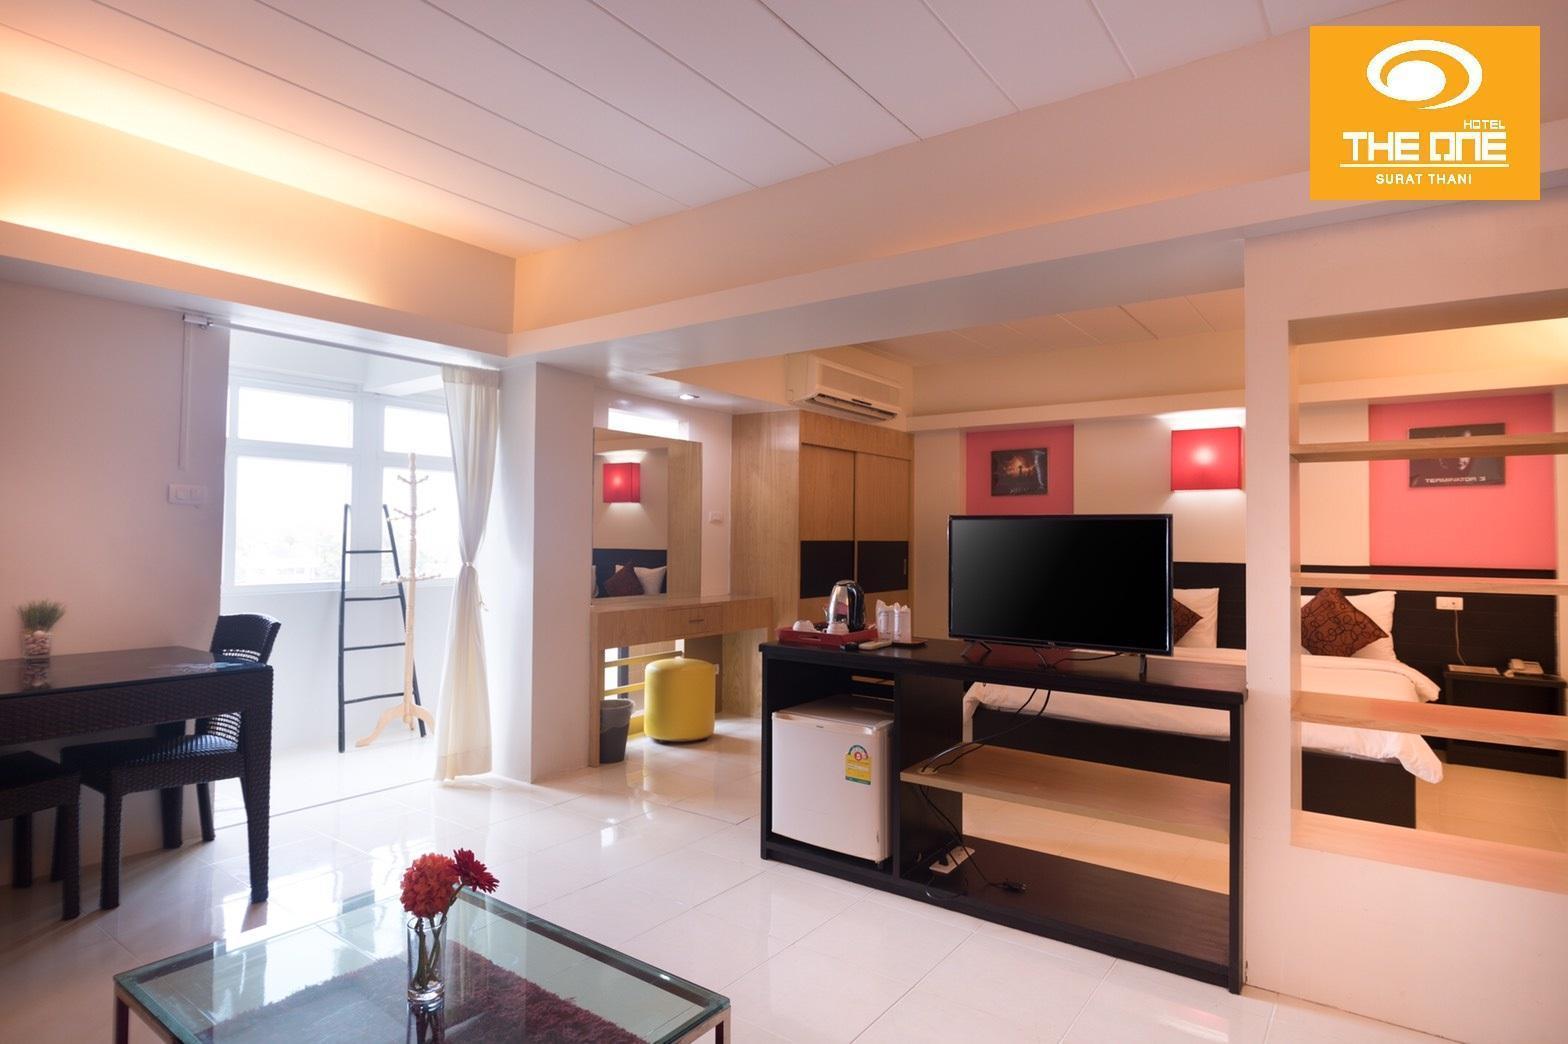 The One Hotel Surat โรงแรมเดอะวัน สุราษฎร์